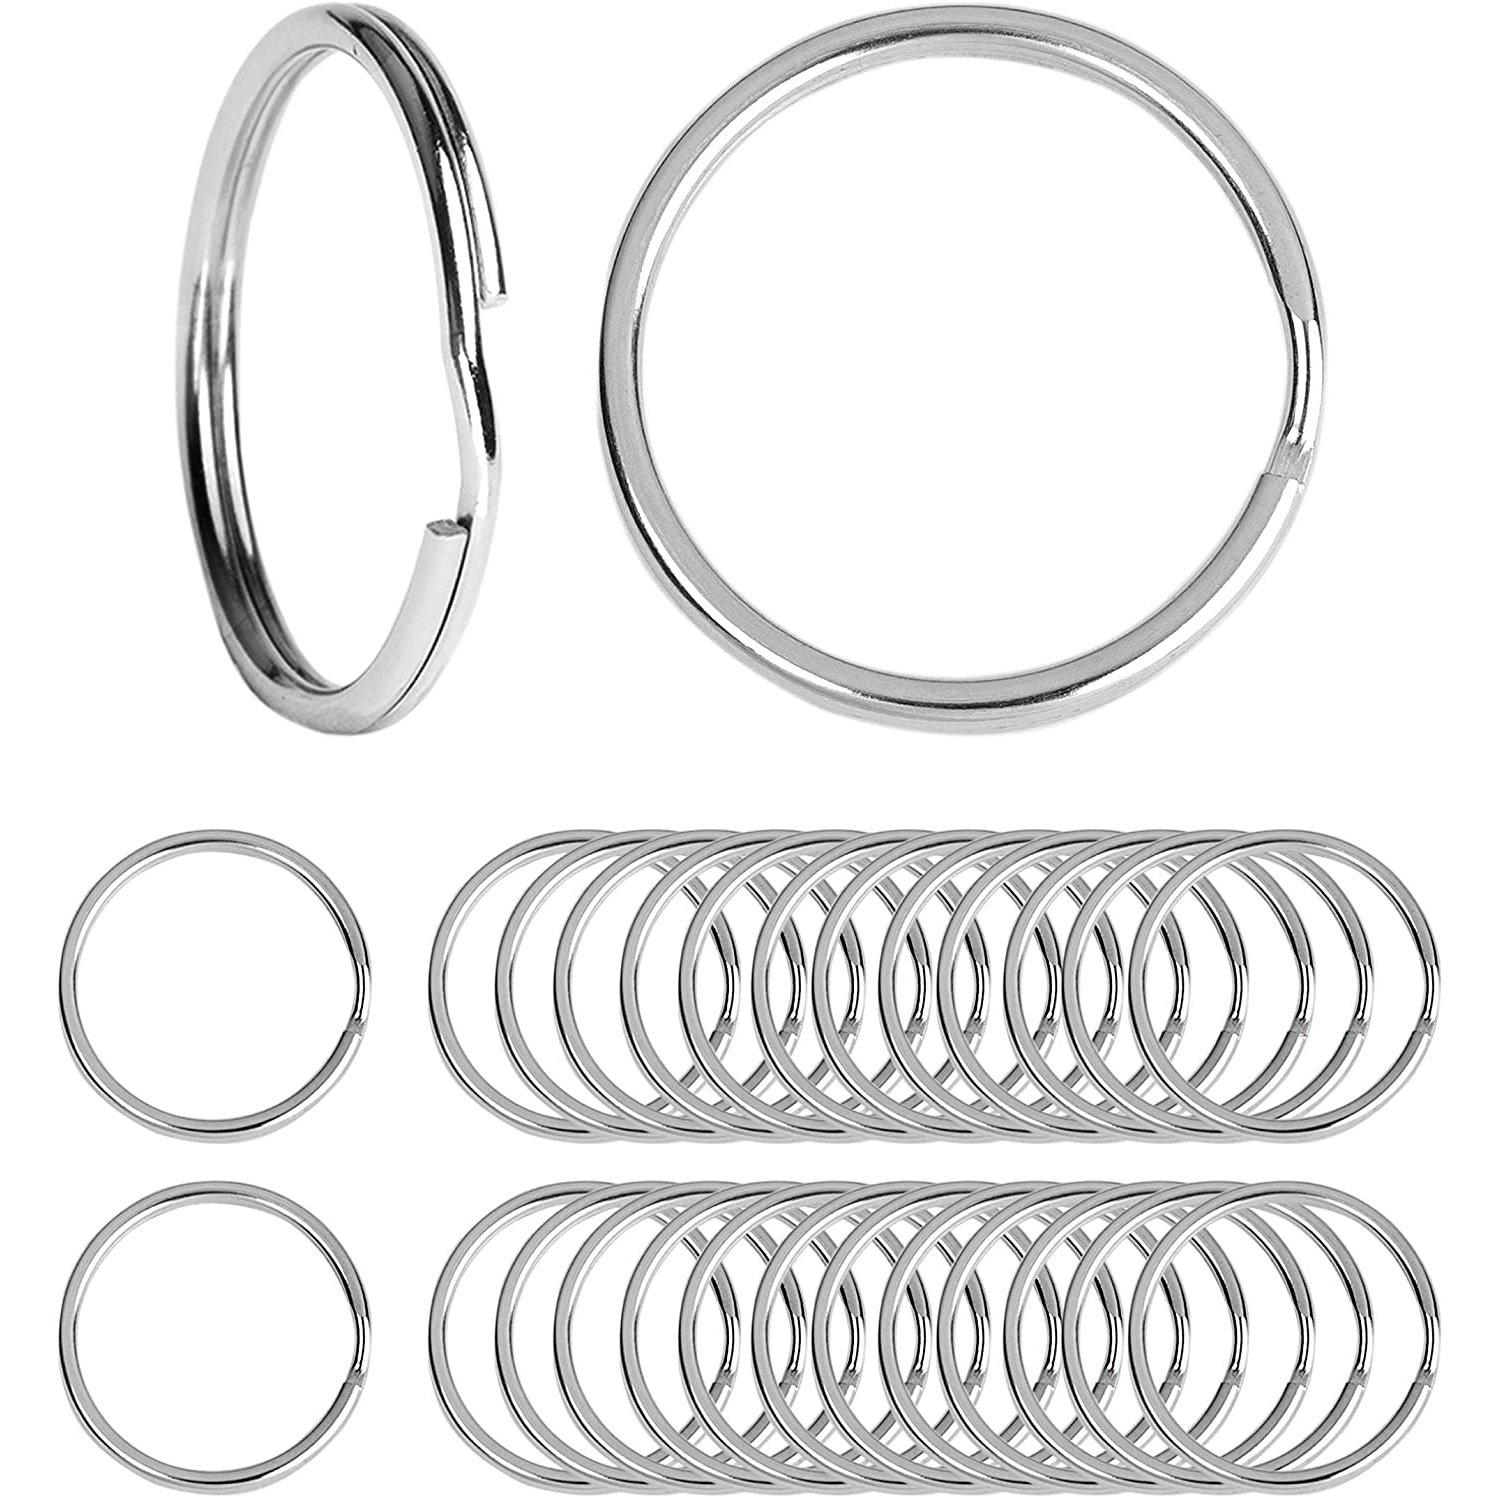 Beadnova Key Chain Ring Metal Split Ring-20mm